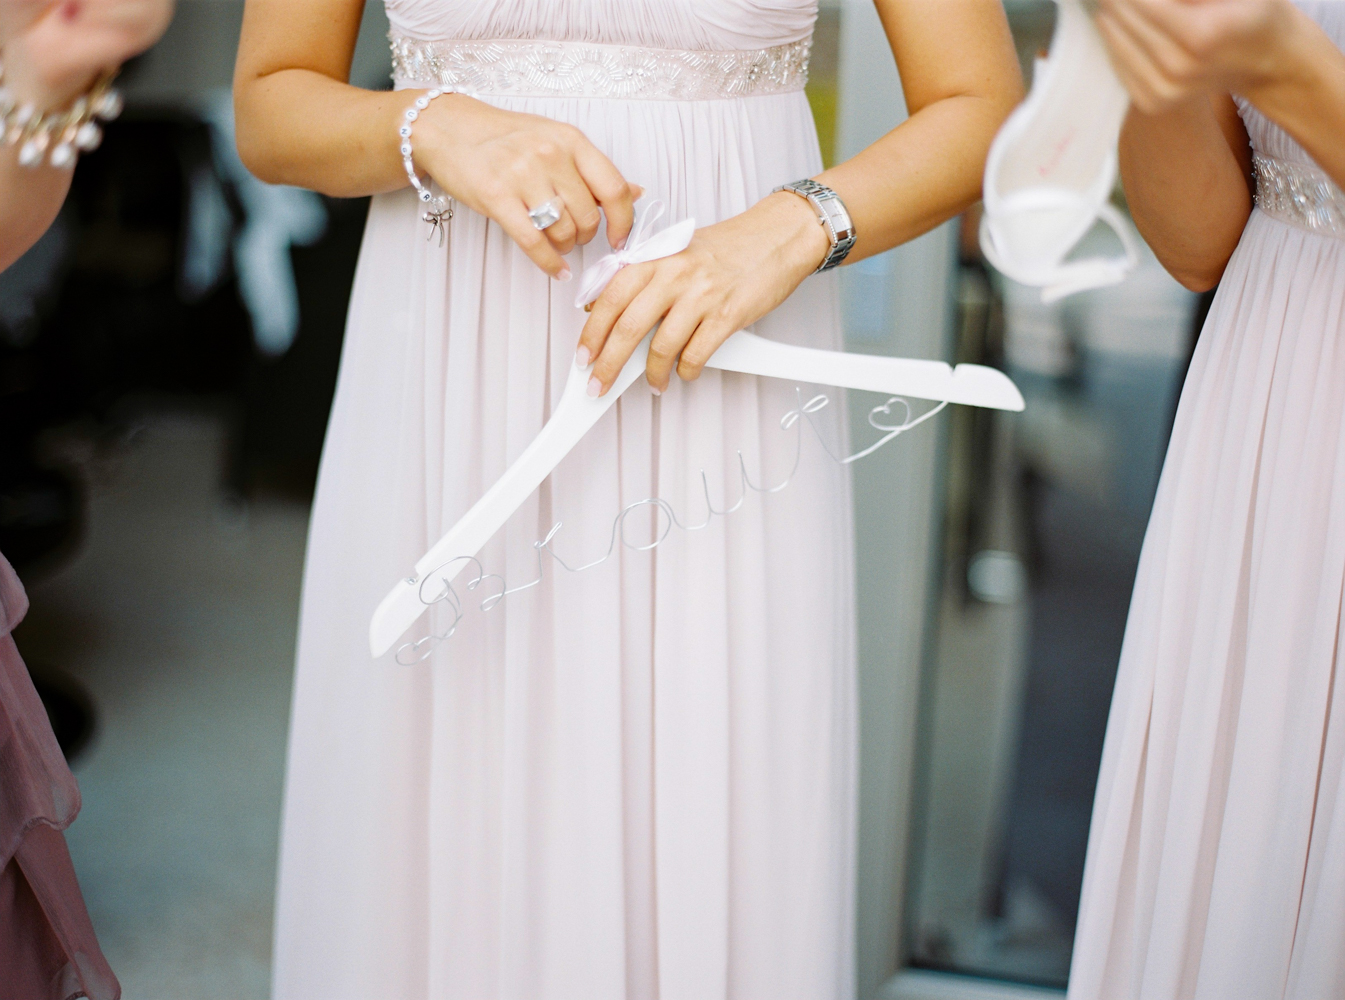 Hochzeitsfotograf_Stuttgart_Karoline_Kirchhof (5).jpg